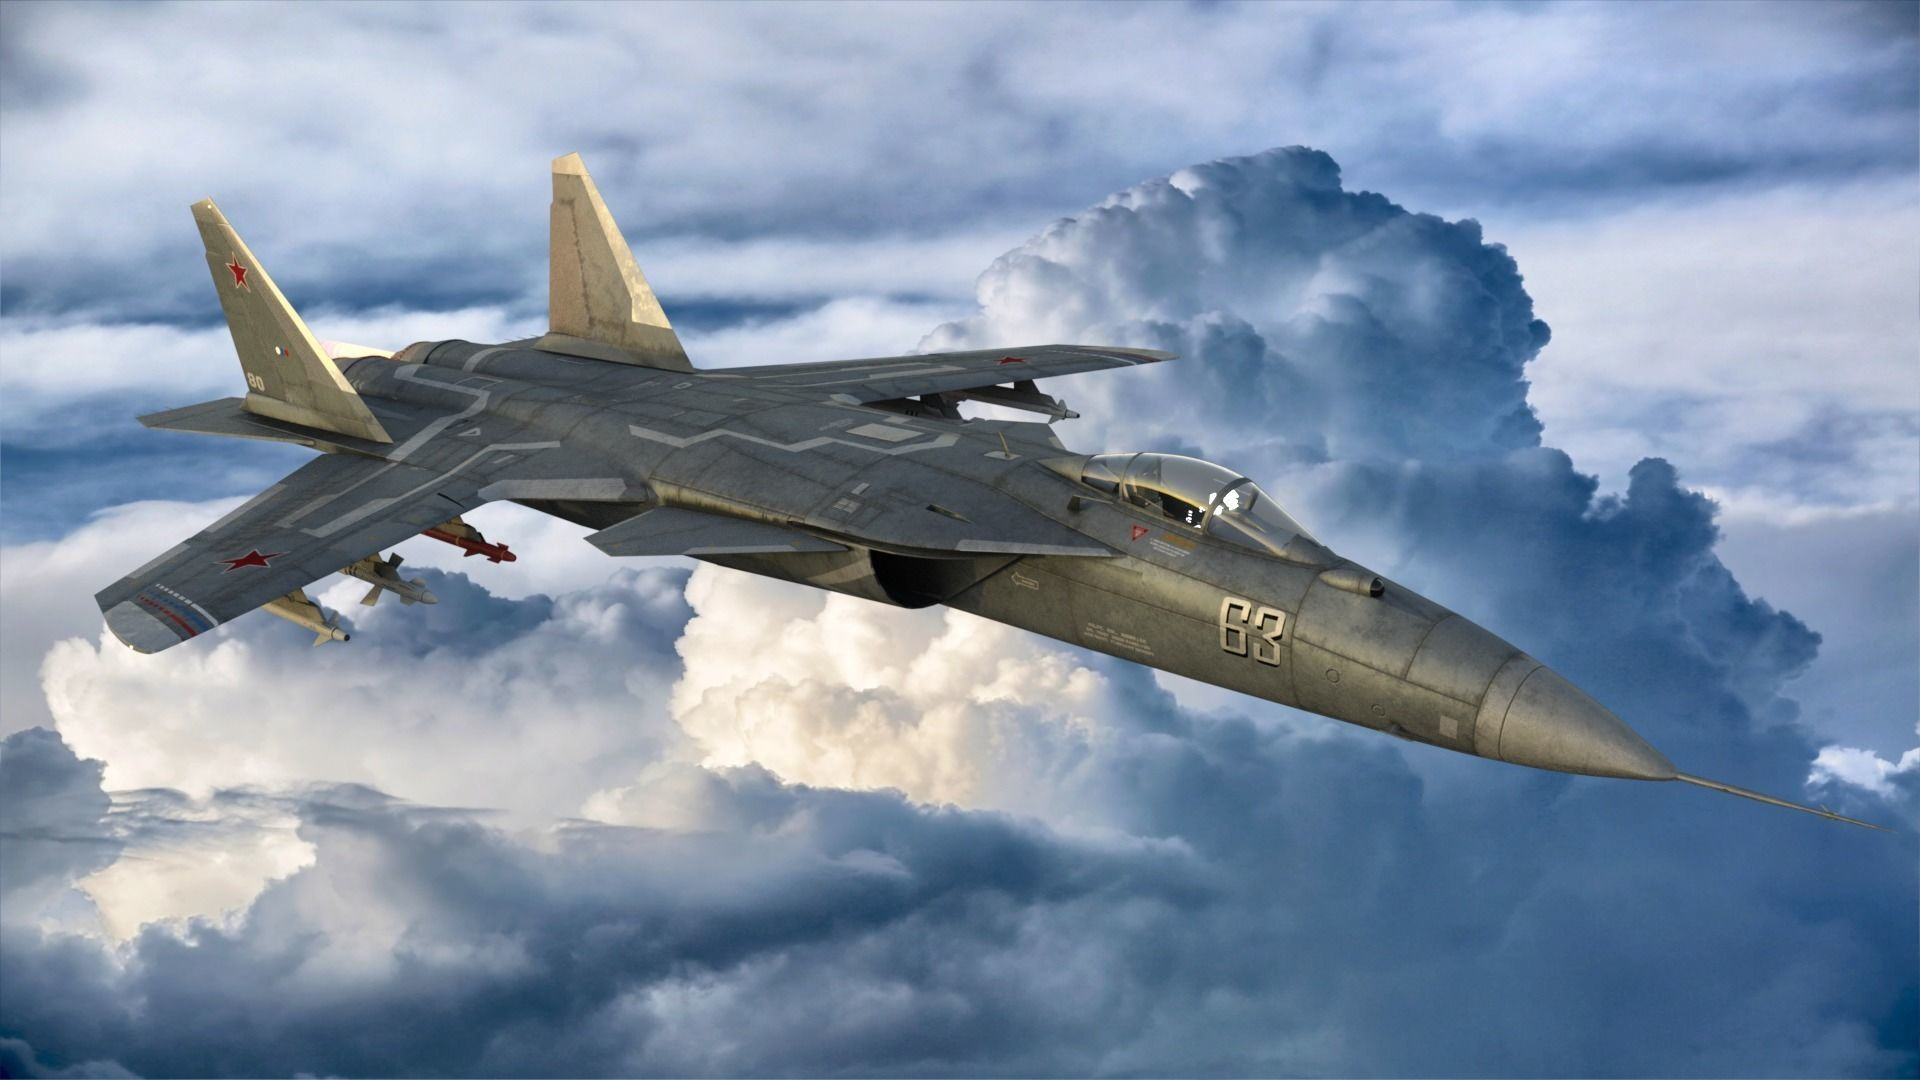 Beast fighter jet